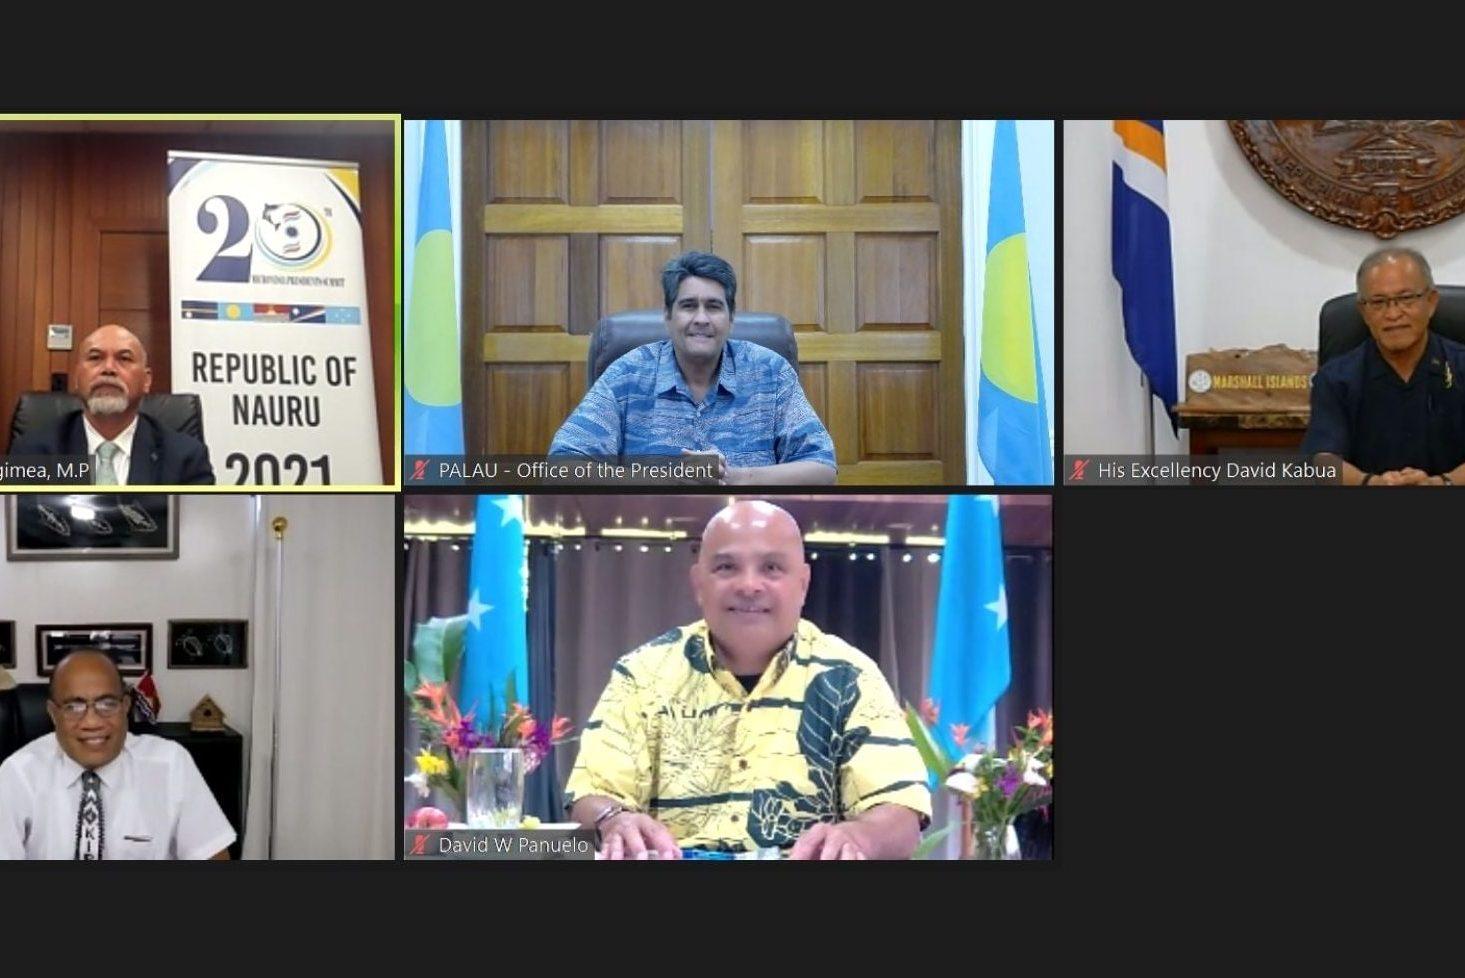 Nauru President Lionel Aingimea welcomed the four presidents of Kiribati, Taneti Maamau; Federated States of Micronesia, David Panuelo; Republic of the Marshall Islands, David Kabua; and Palau, Surangel Whipps Jr.